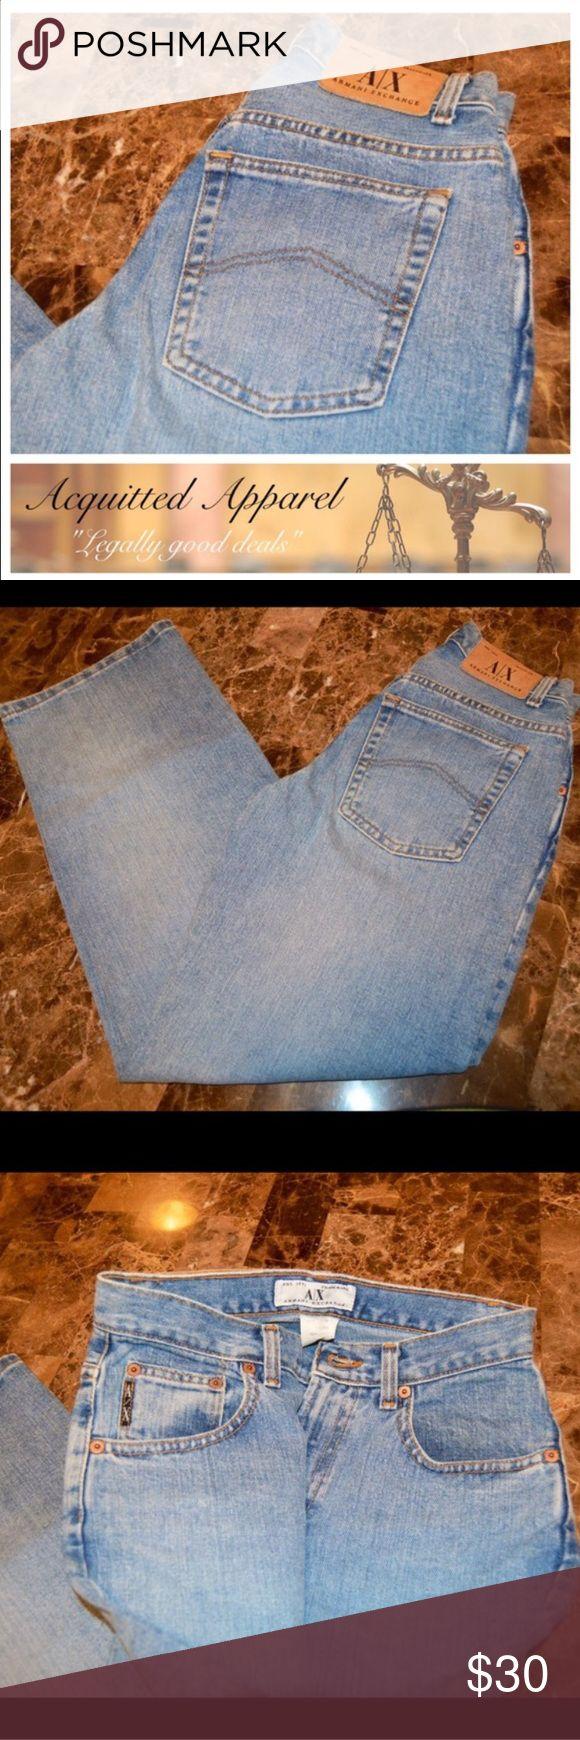 Armani Mom Jeans High Waisted Straight Leg Armani Exchange A|X Jeans Size 2 Mom jean high waisted vintage style. Armani Exchange Jeans Straight Leg